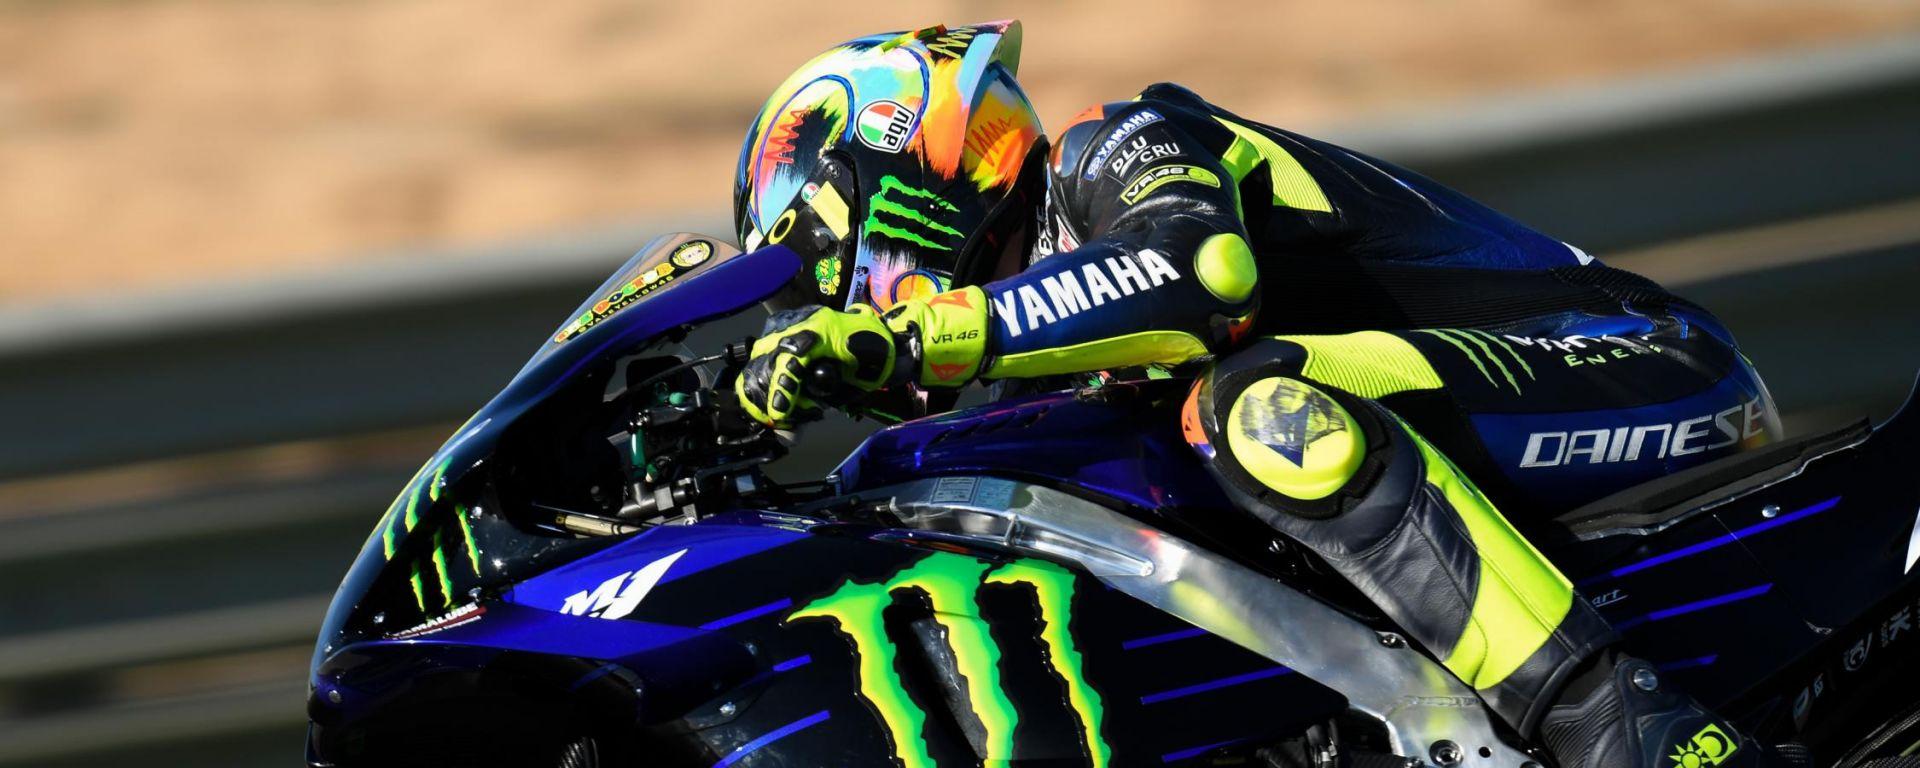 Test Valencia MotoGP 2019: Valentino Rossi (Yamaha)